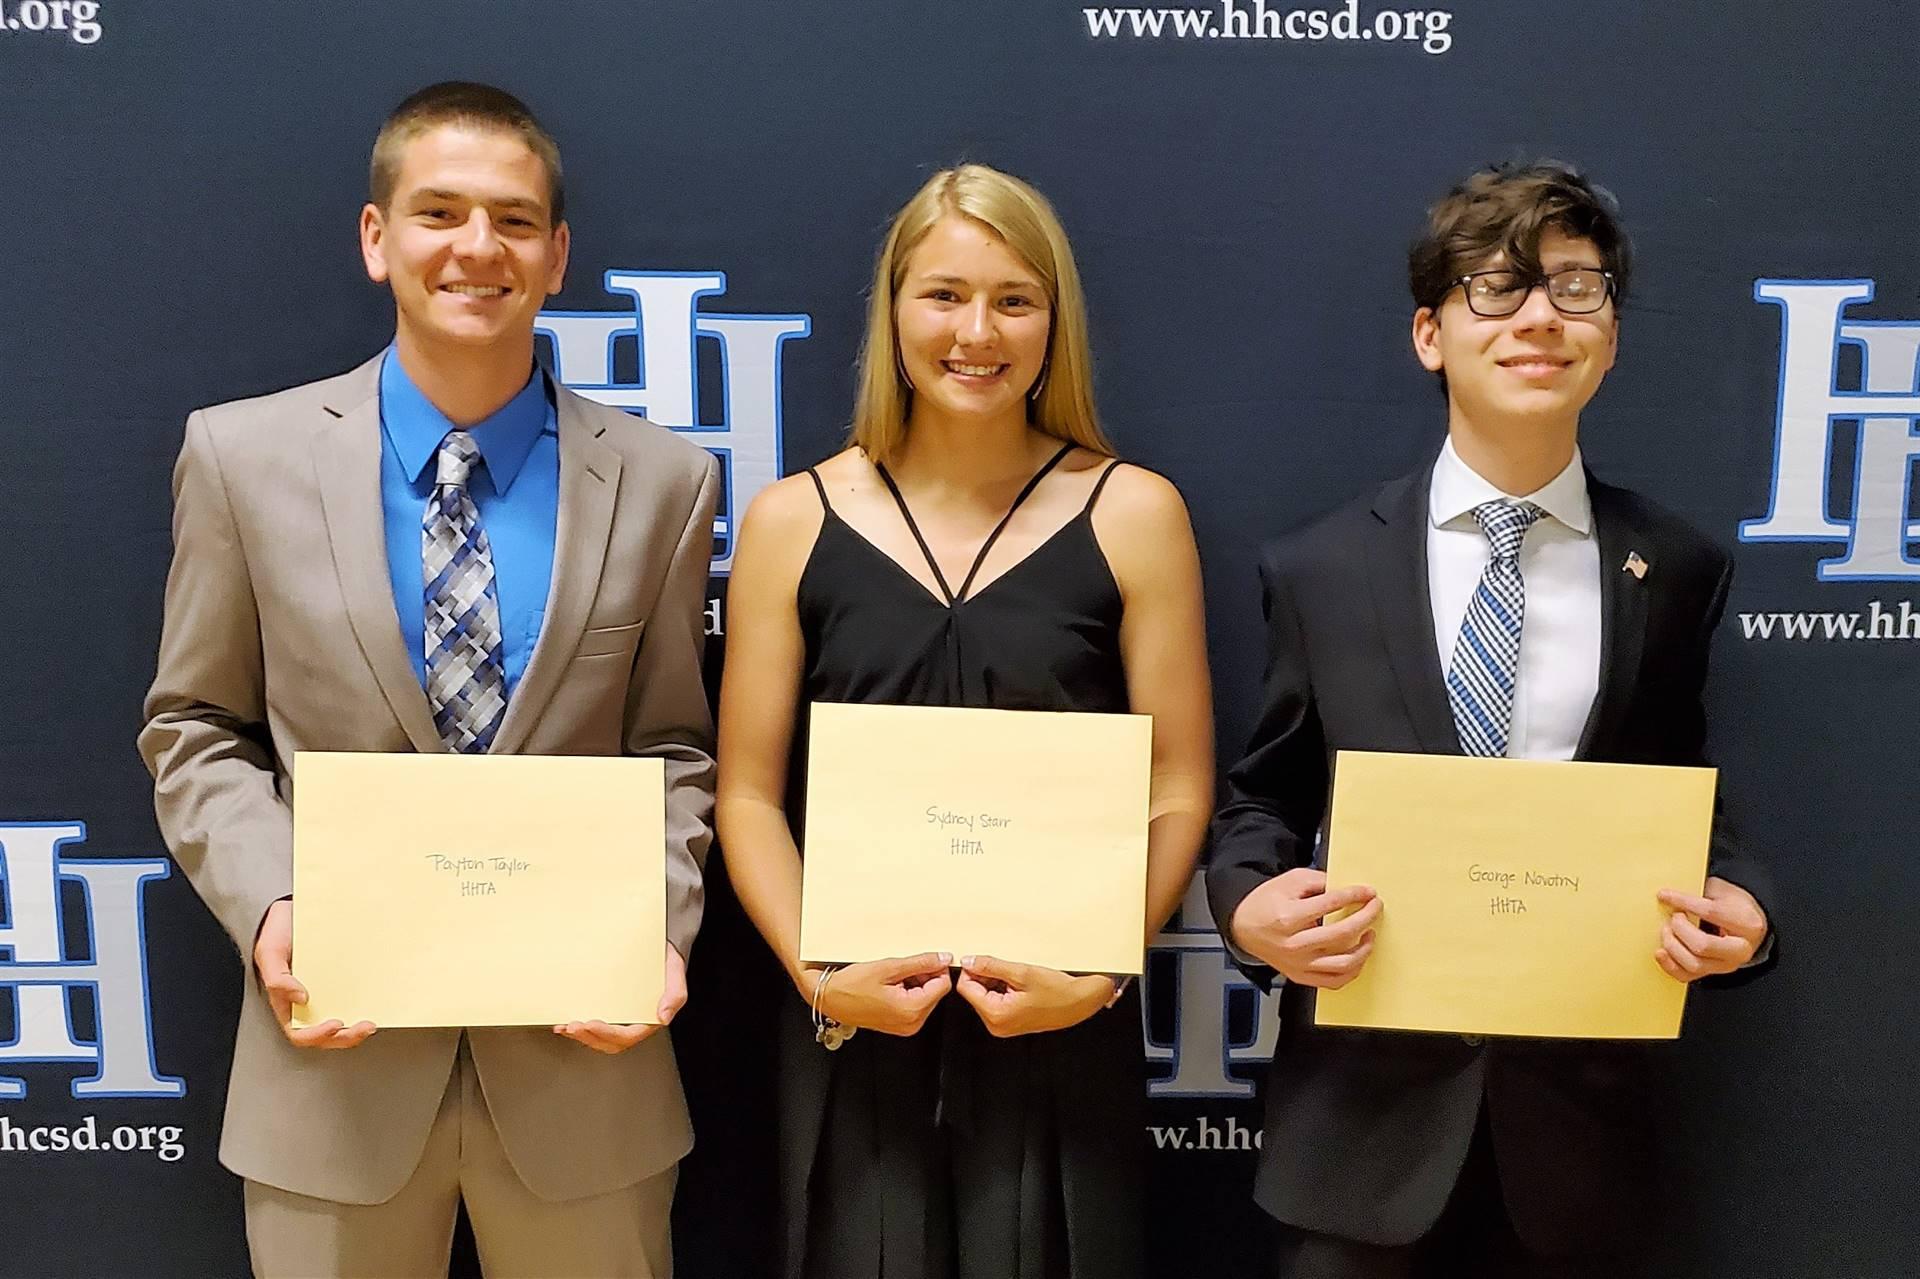 HHTA Scholarship